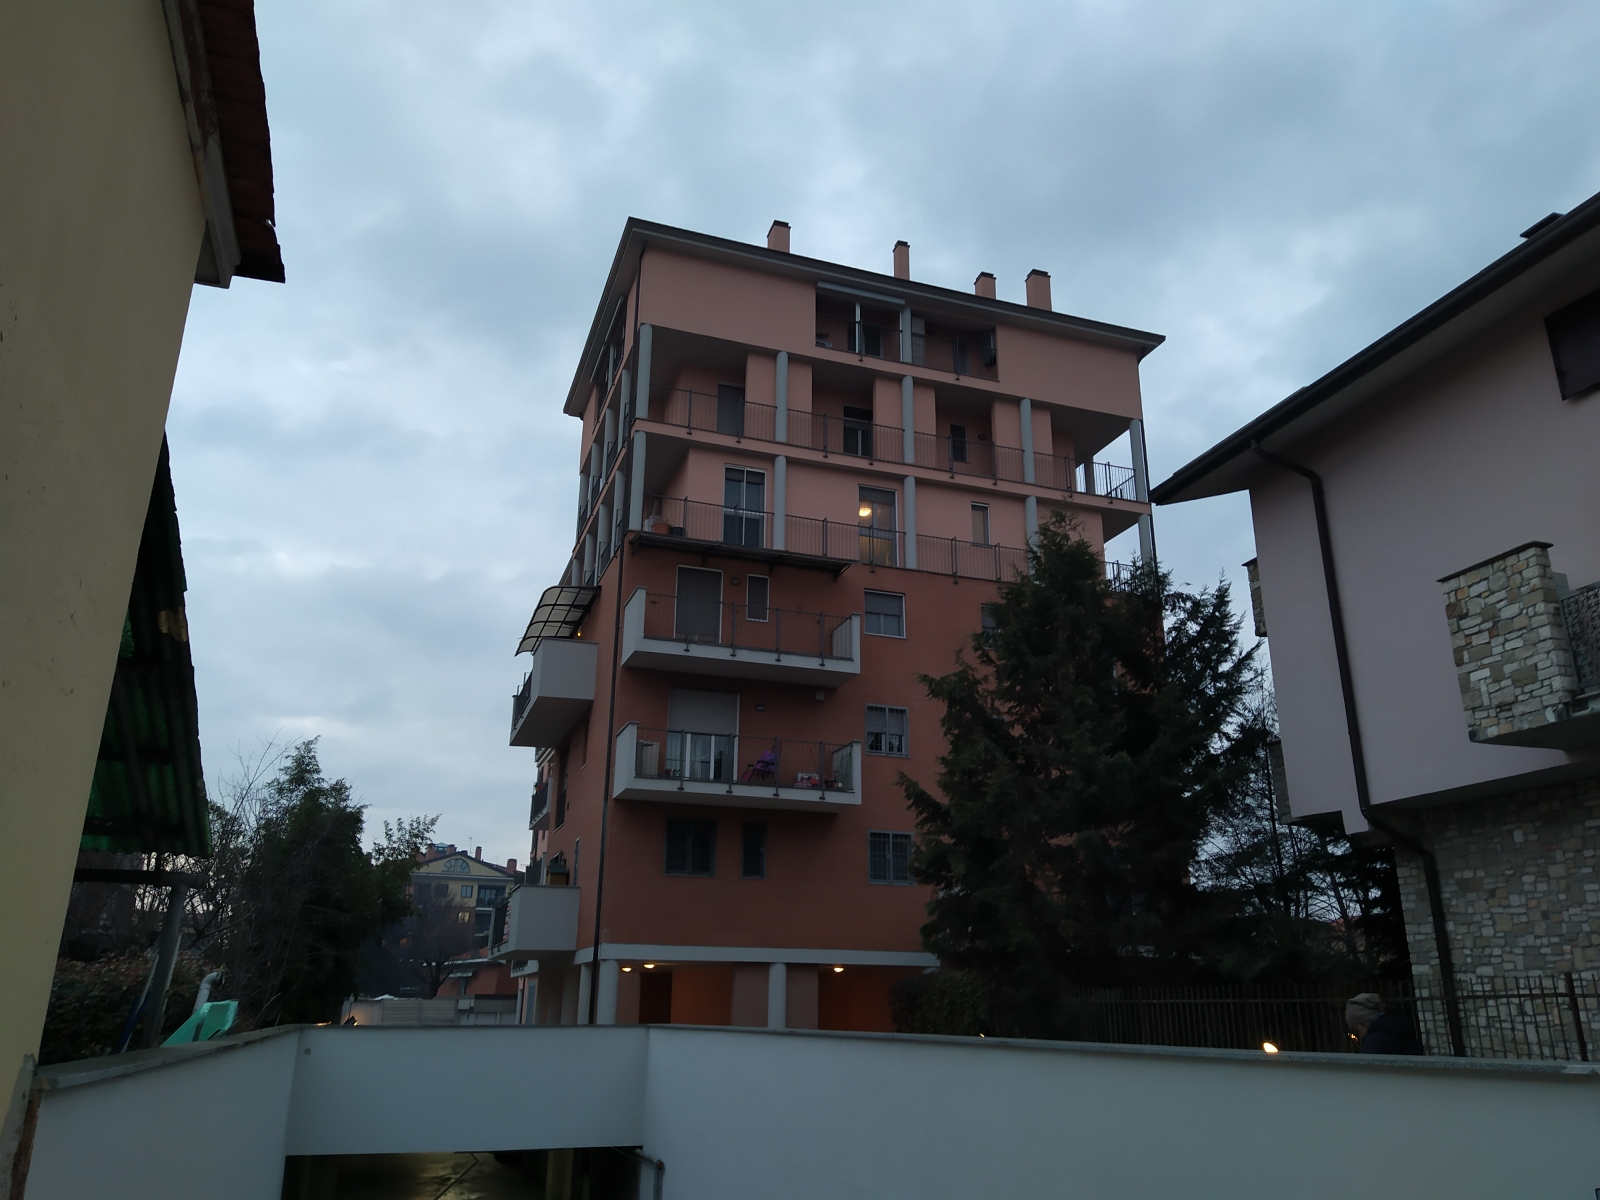 mansarda-muggiano-milano-via-lucera-vendita-spaziourbano-immobiliare-3